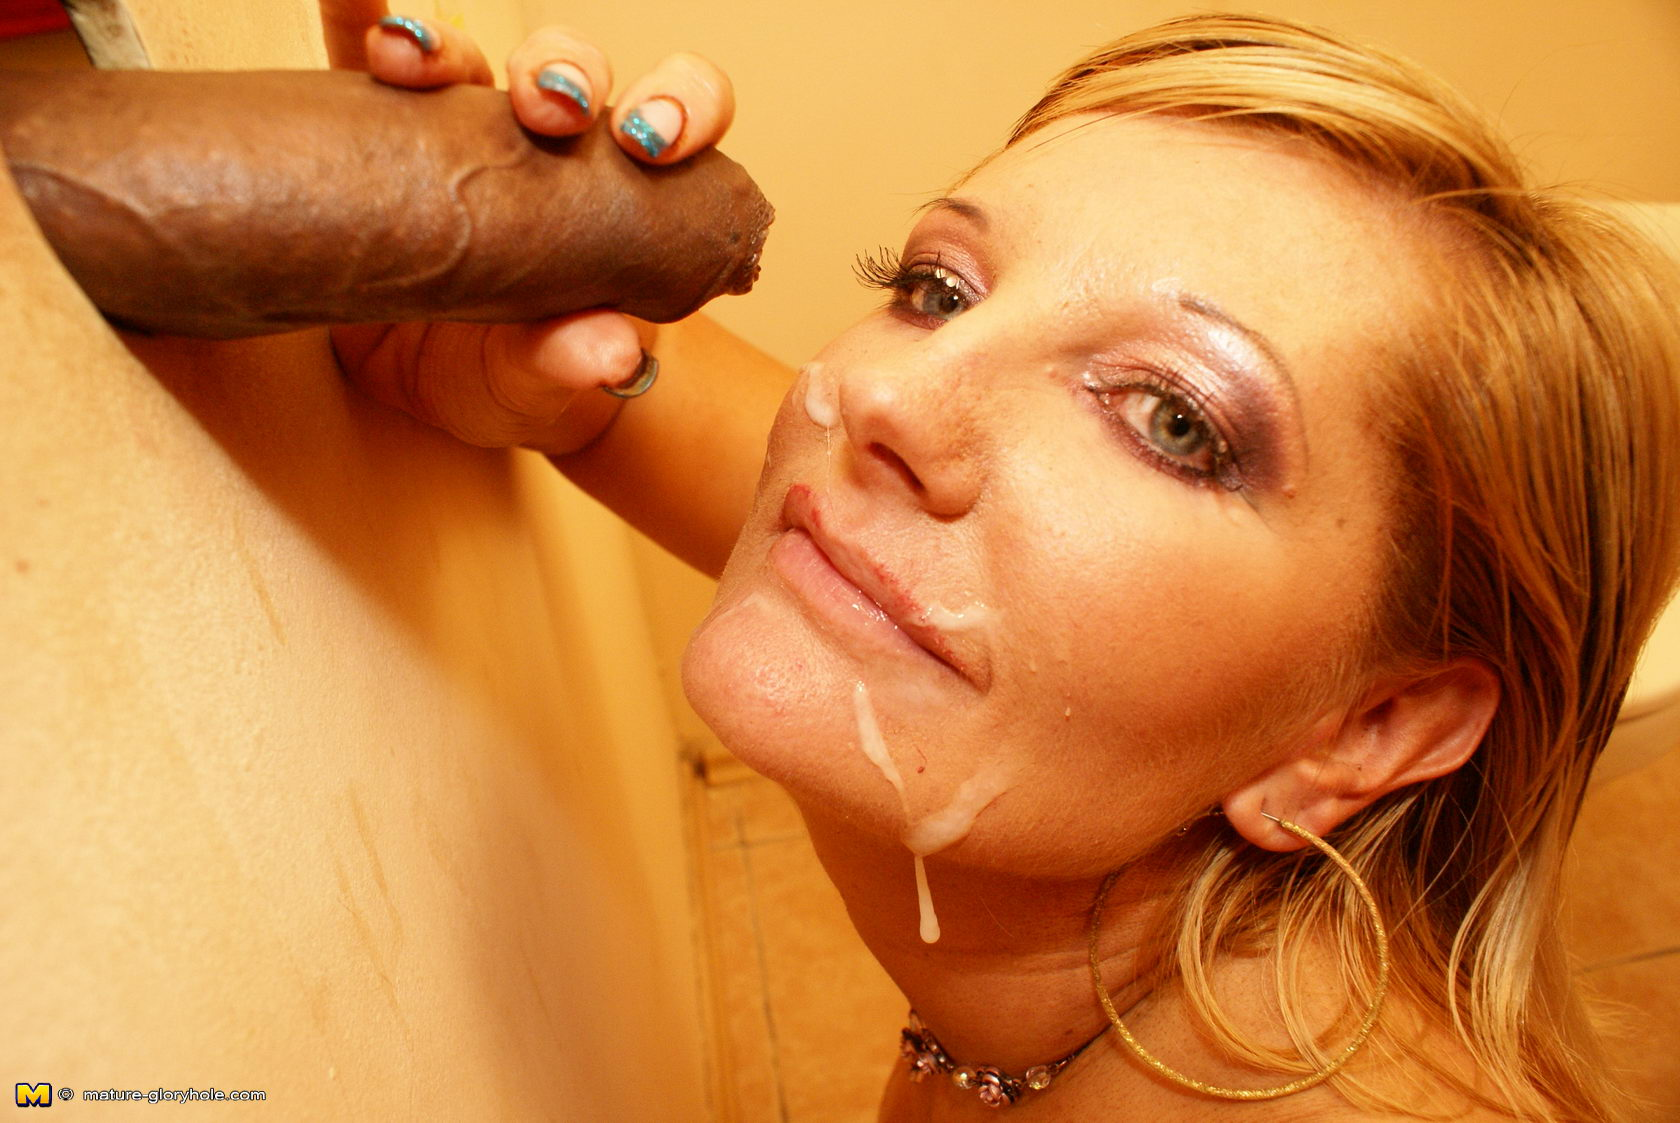 White oral sex